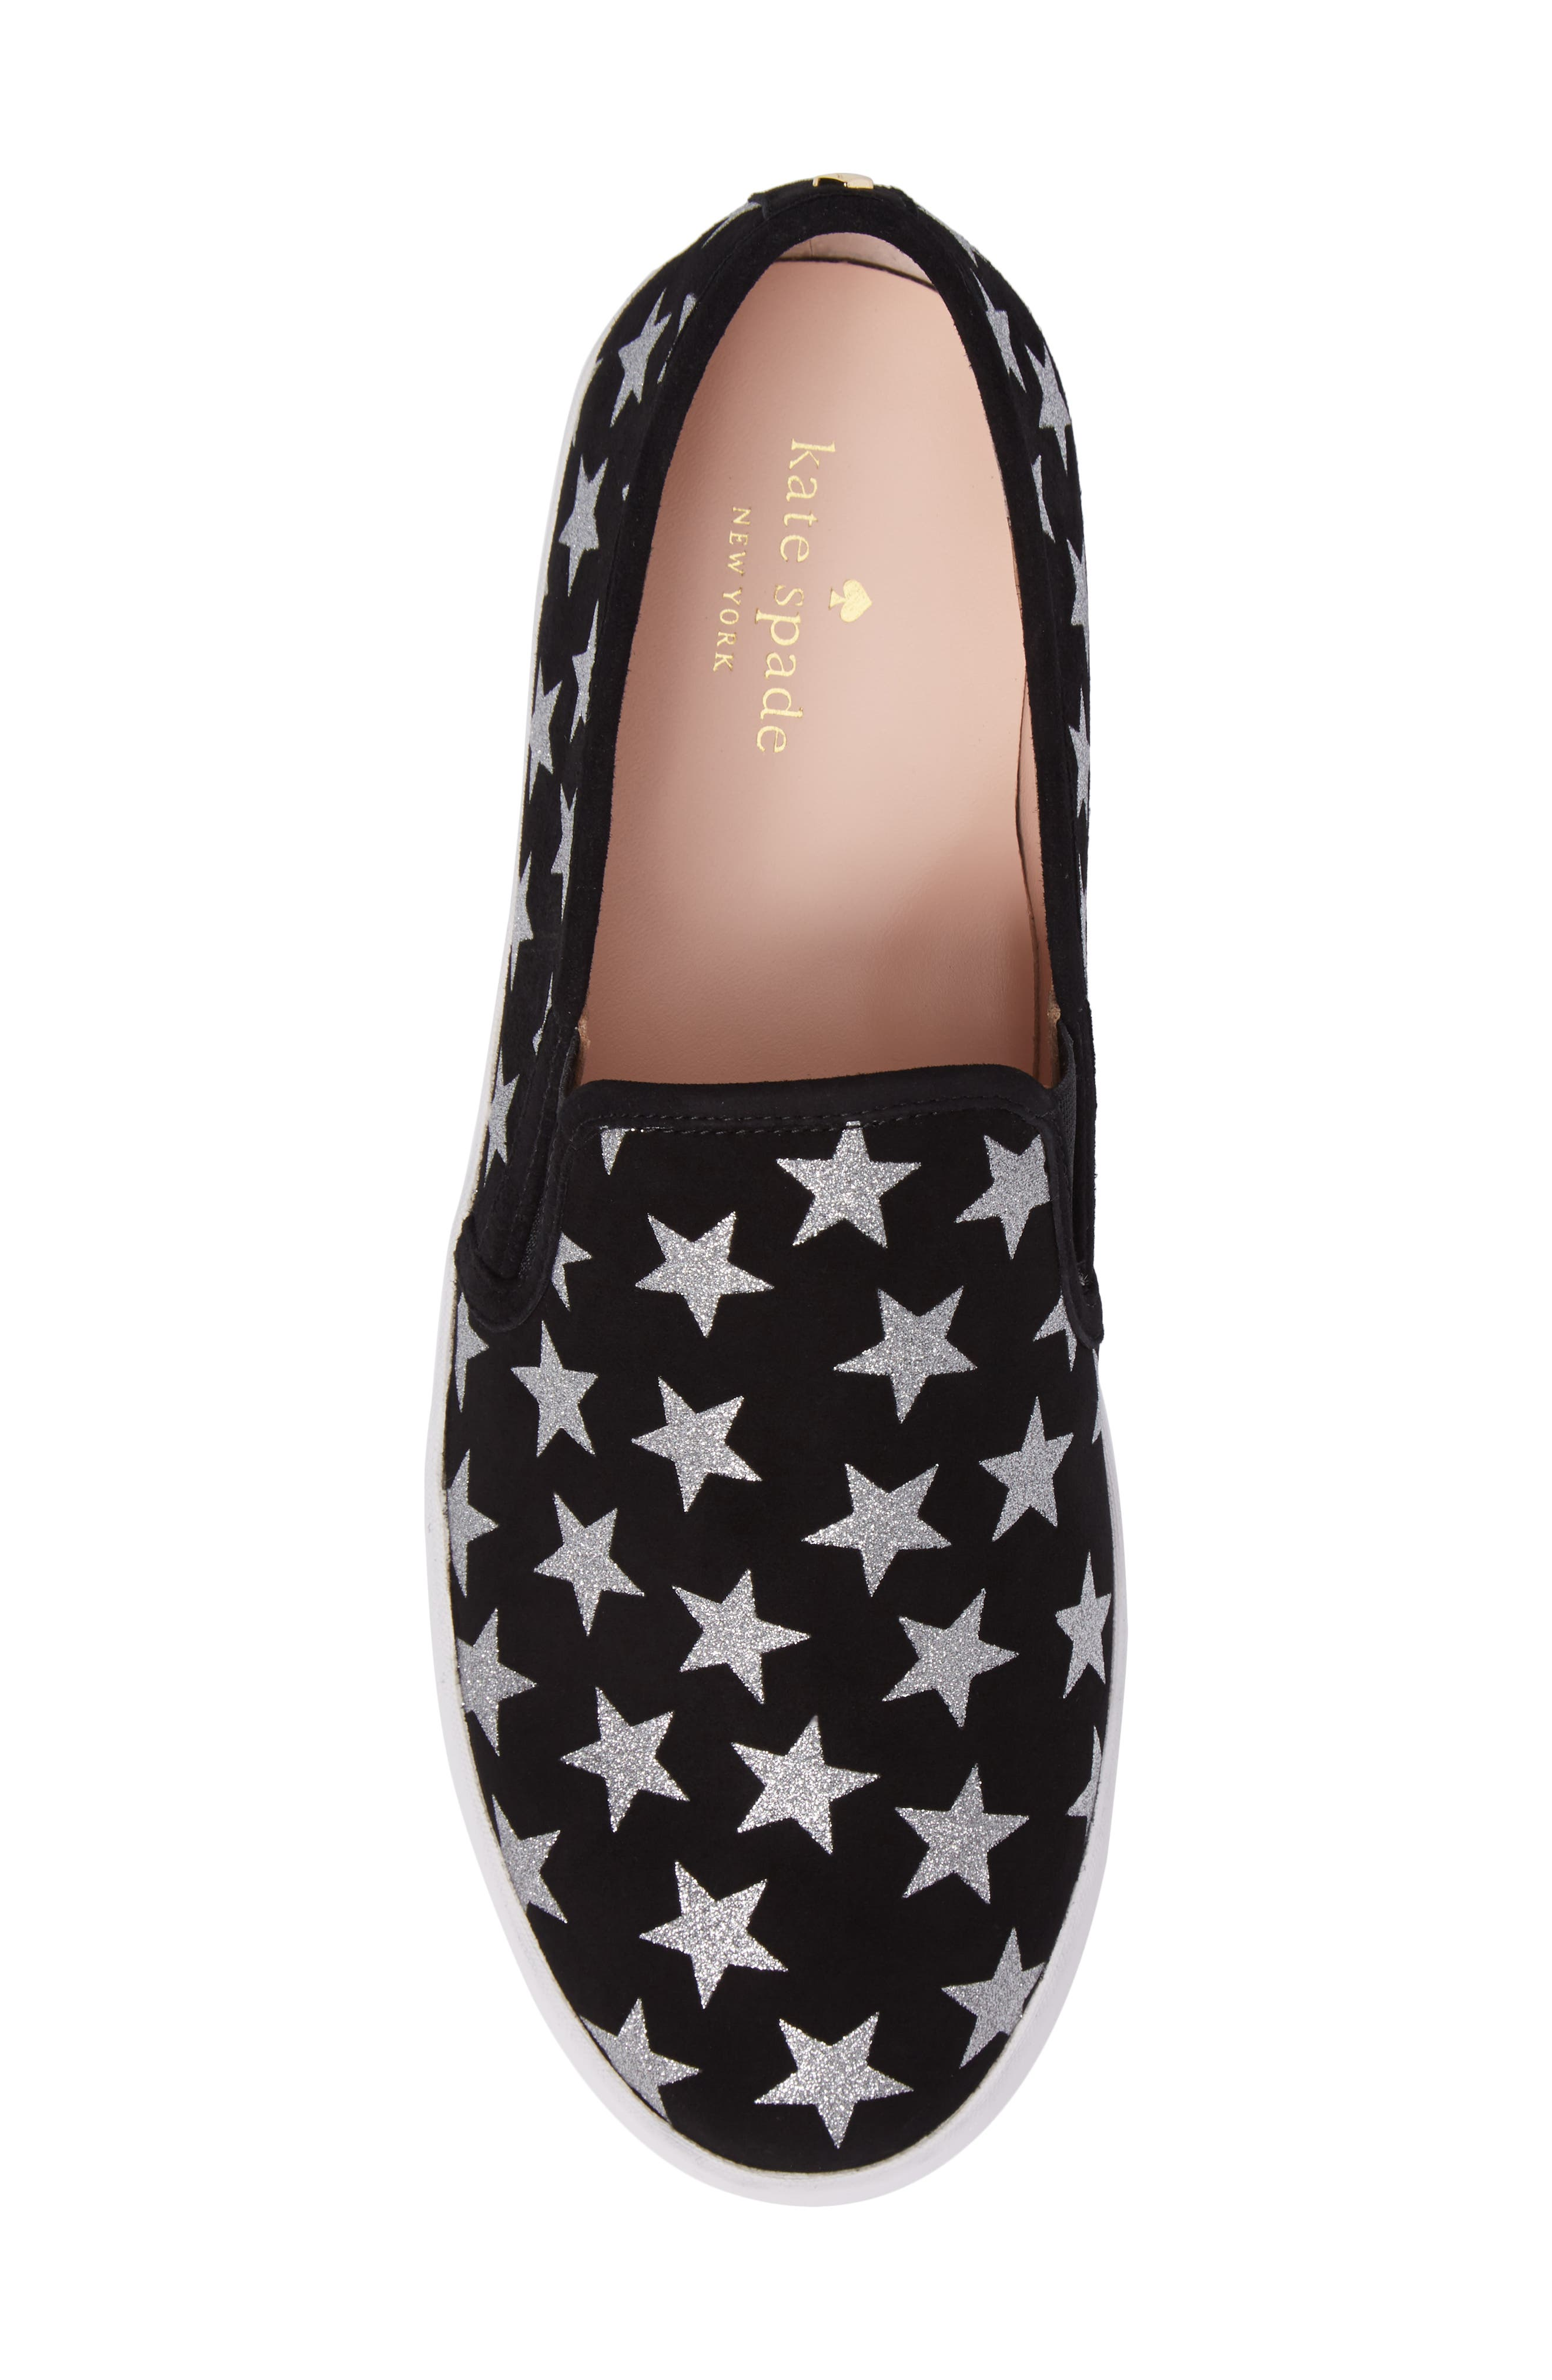 liberty slip-on sneaker,                             Alternate thumbnail 5, color,                             Black/ Silver